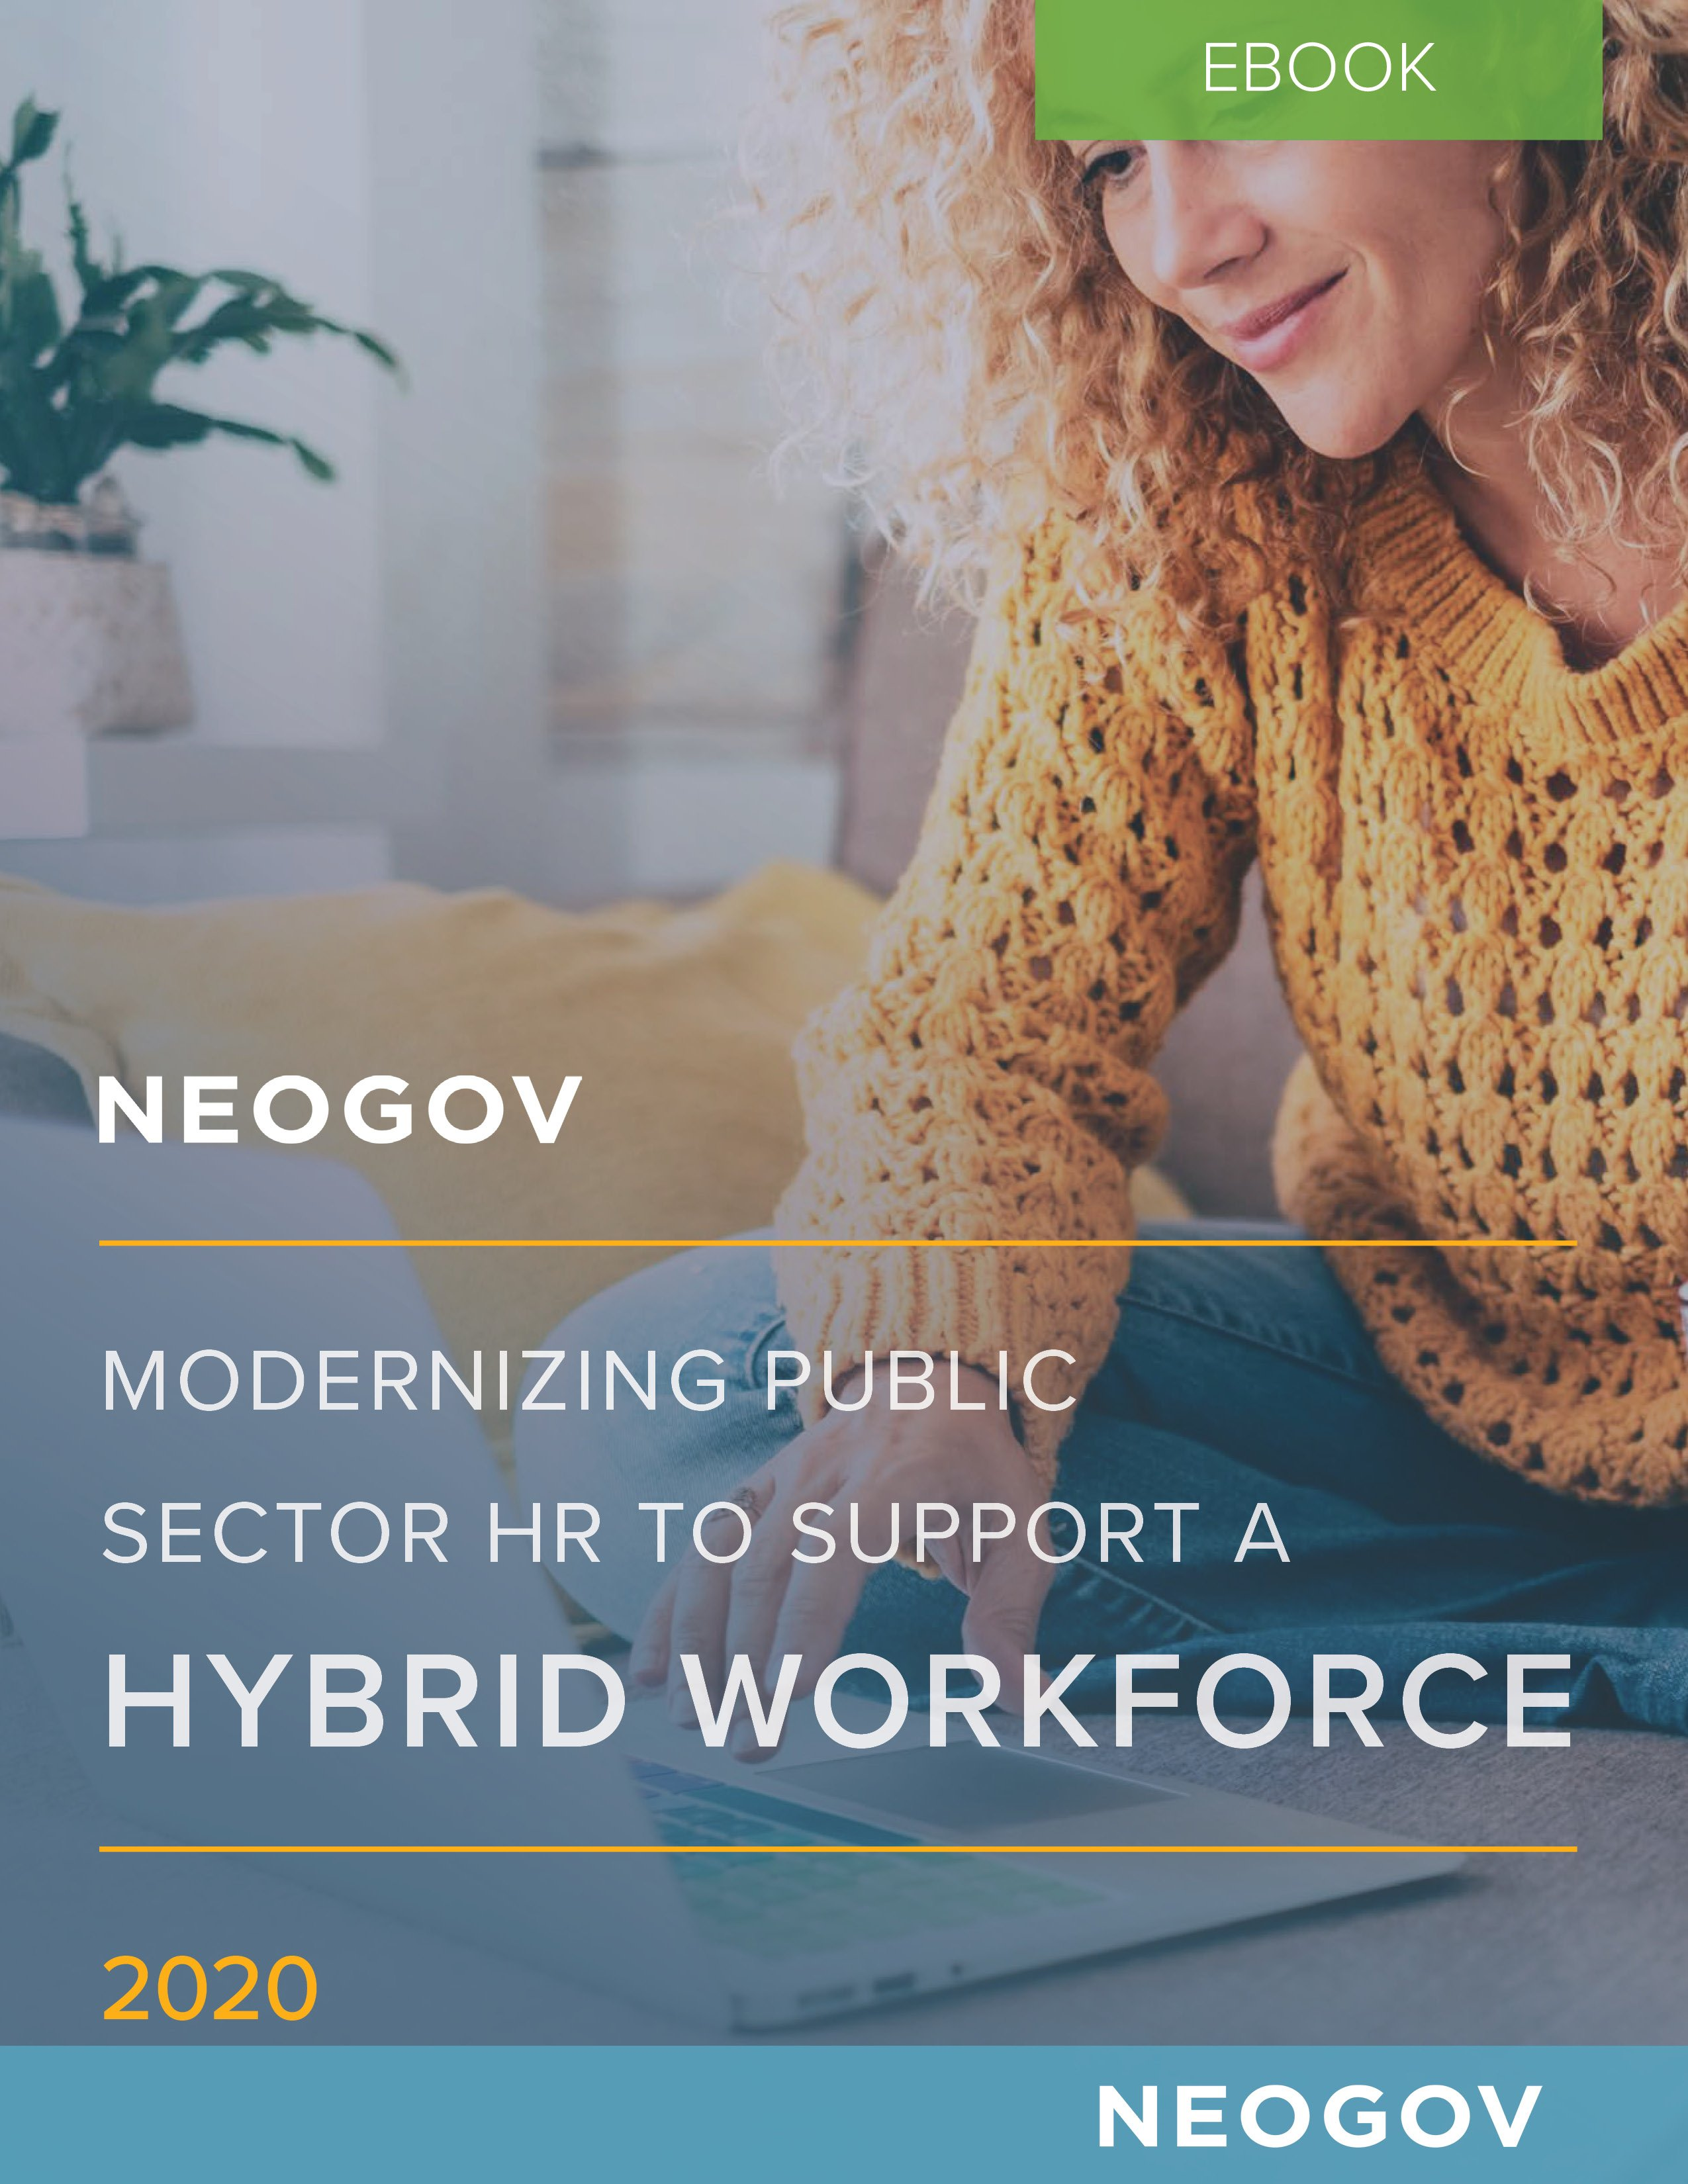 Modernizing Public Sector HR eBook